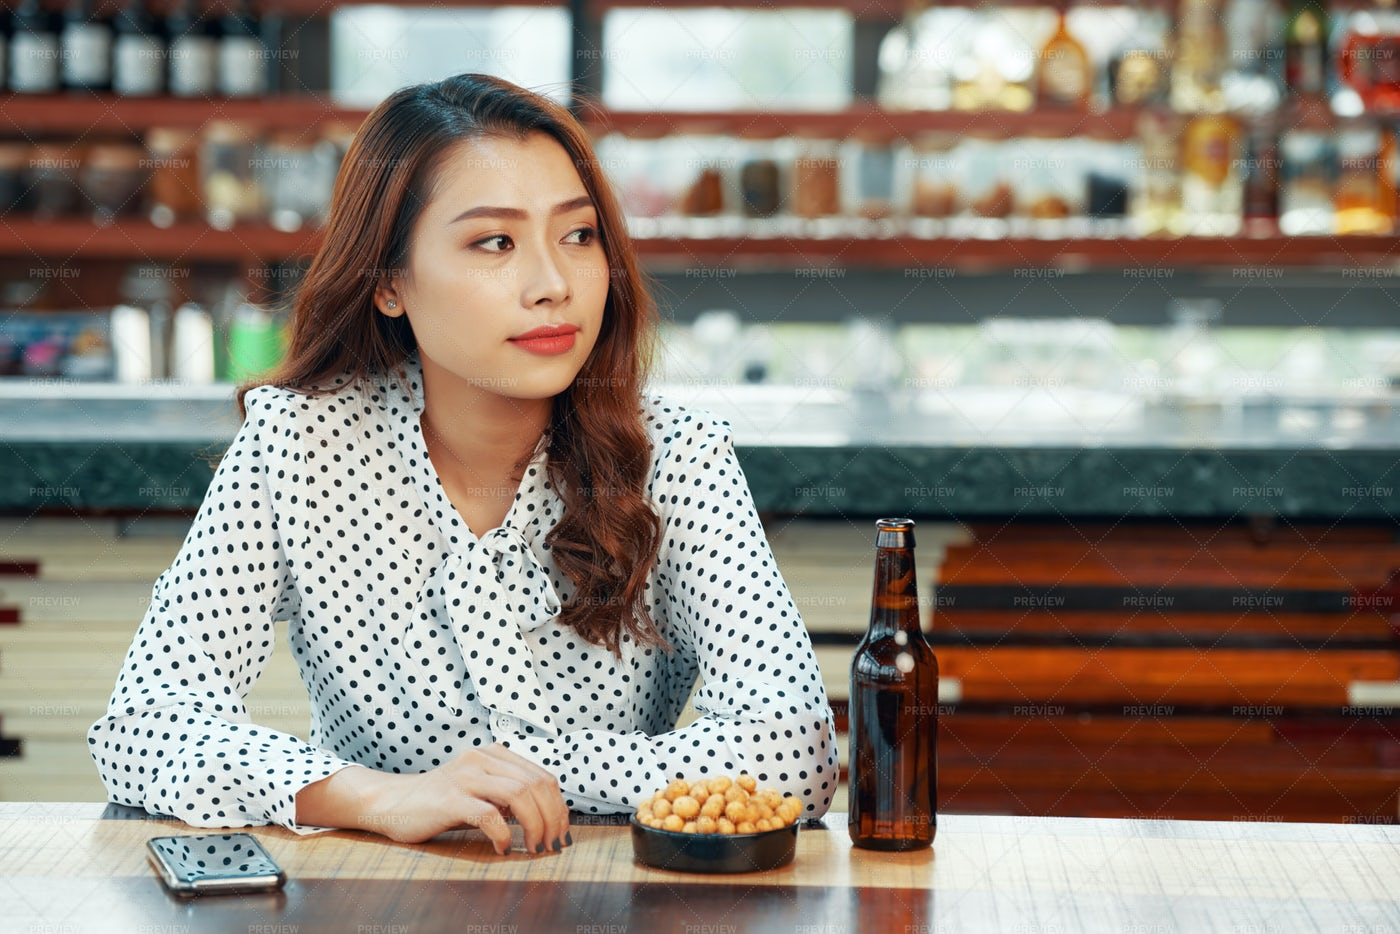 Pretty Woman Waiting In Bar: Stock Photos